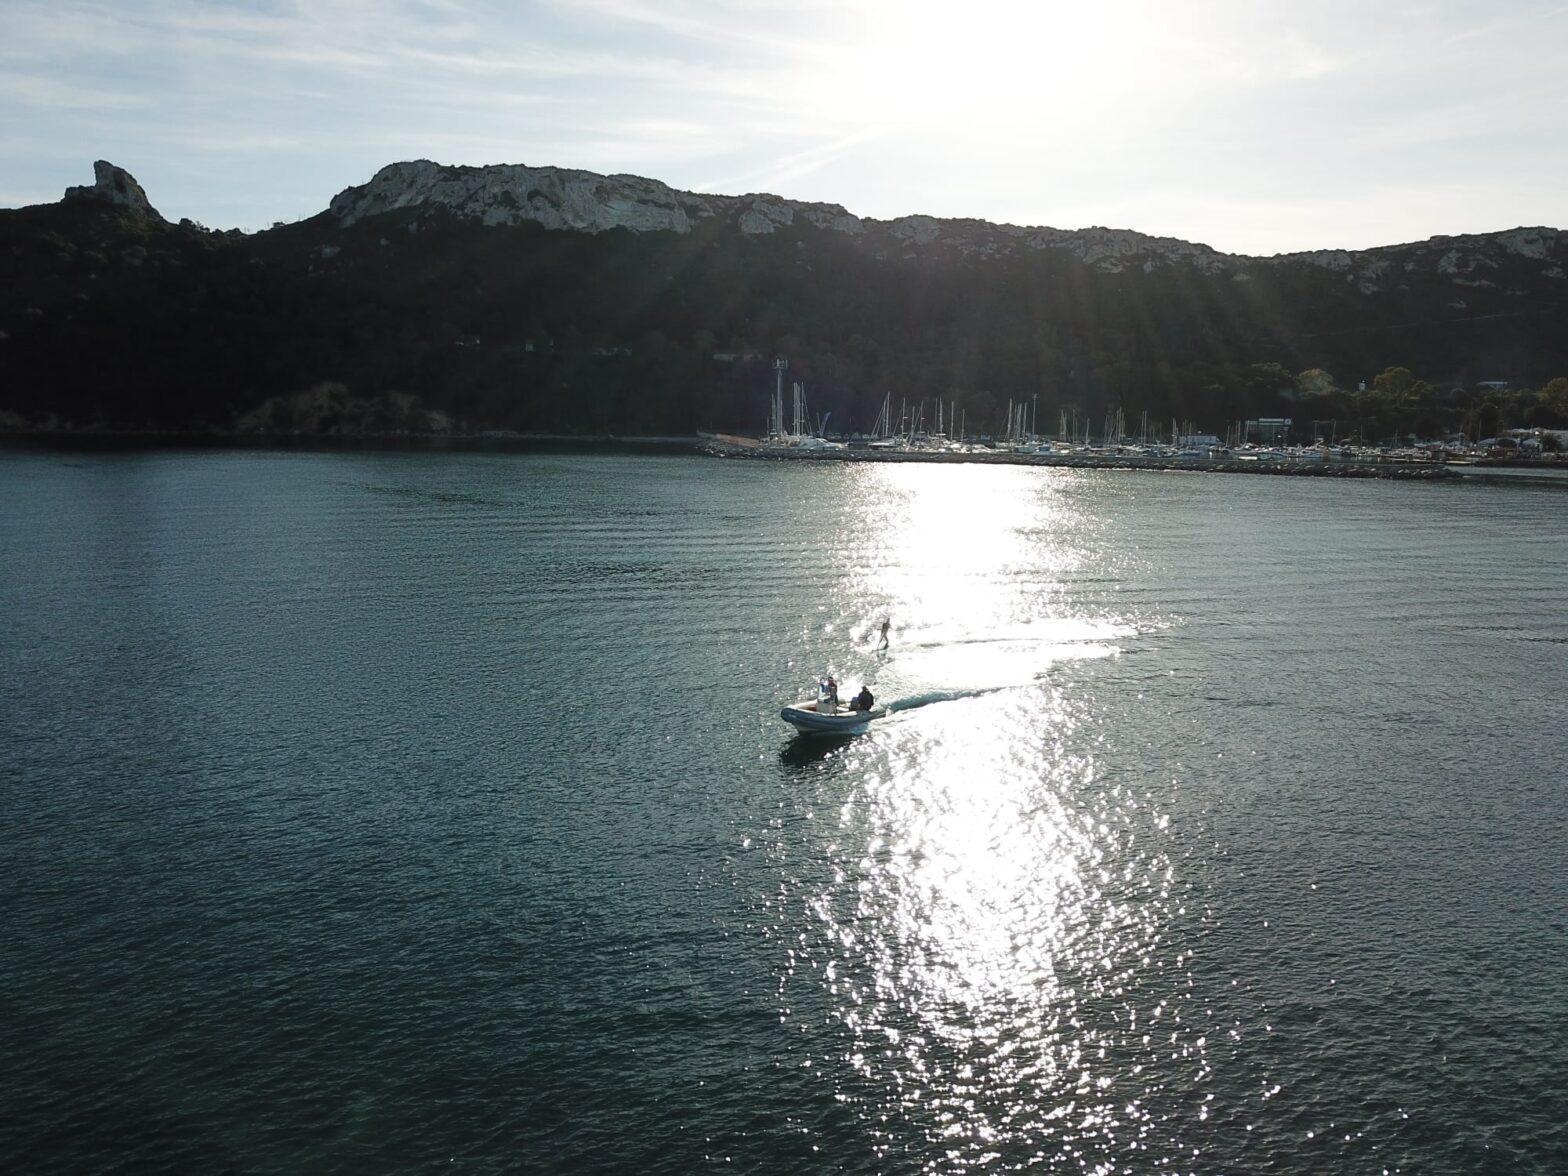 Cagliari Boat Tour to Villasimius